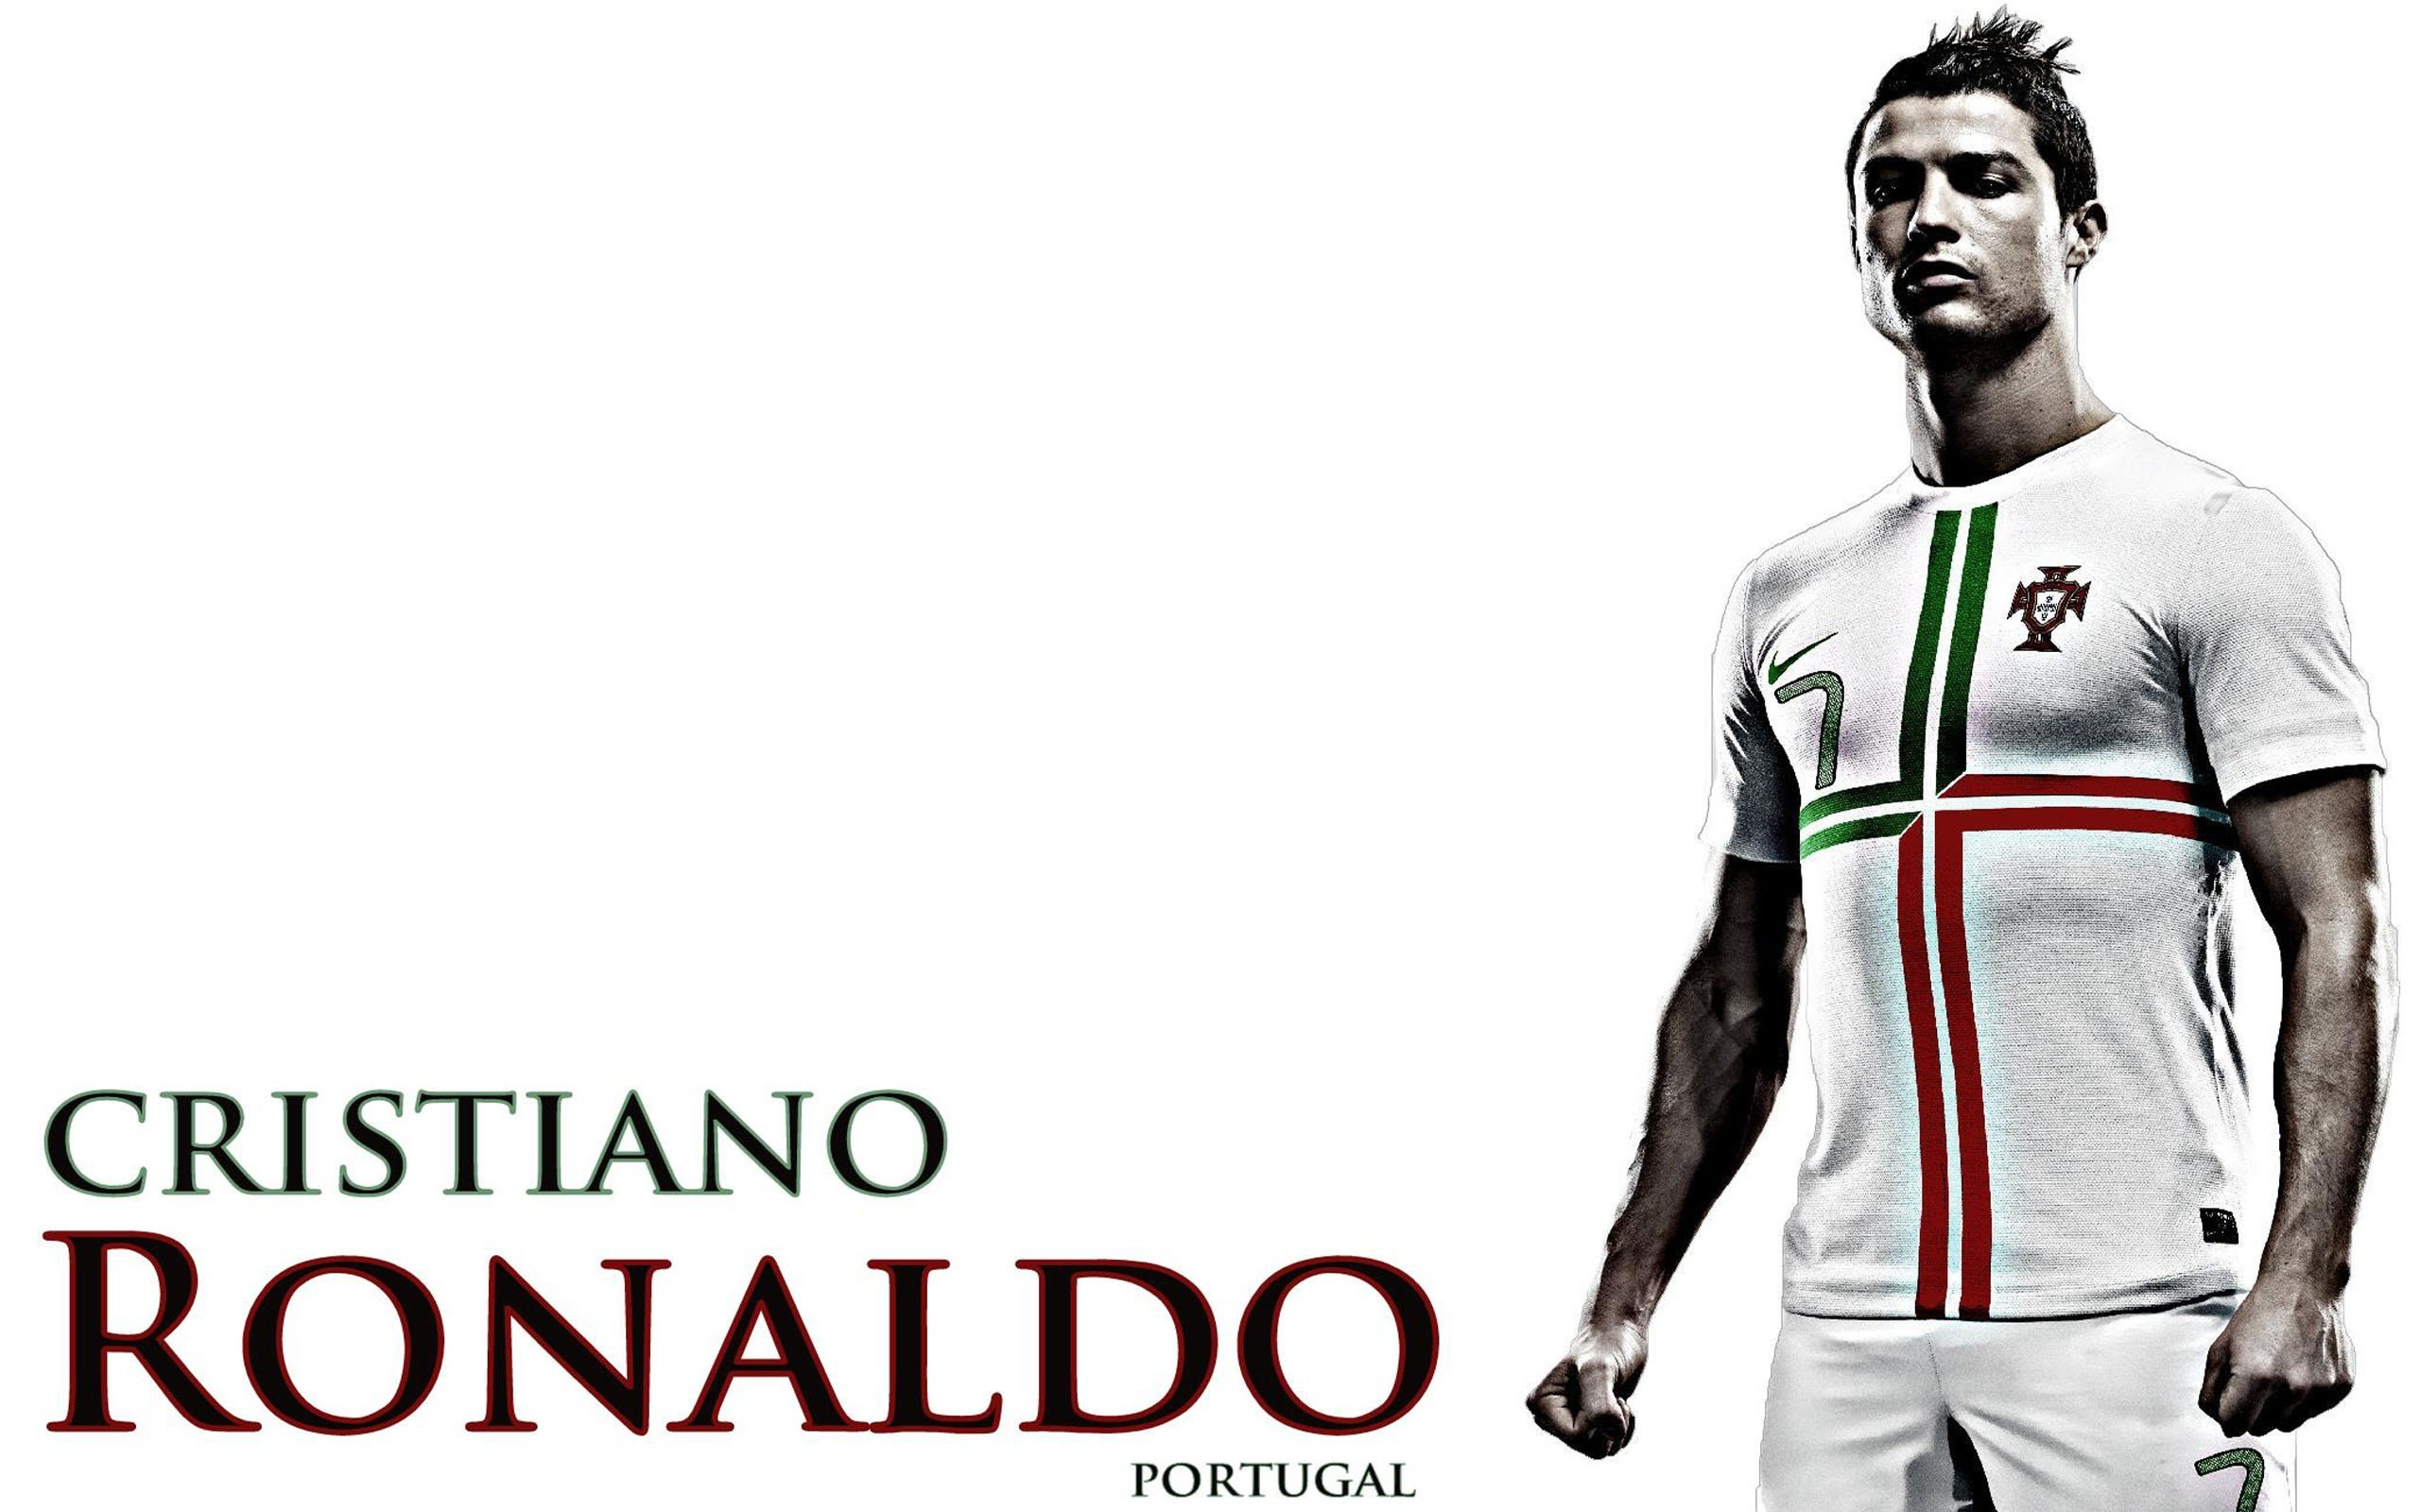 Cristiano Ronaldo Wallpaper Portugal football team